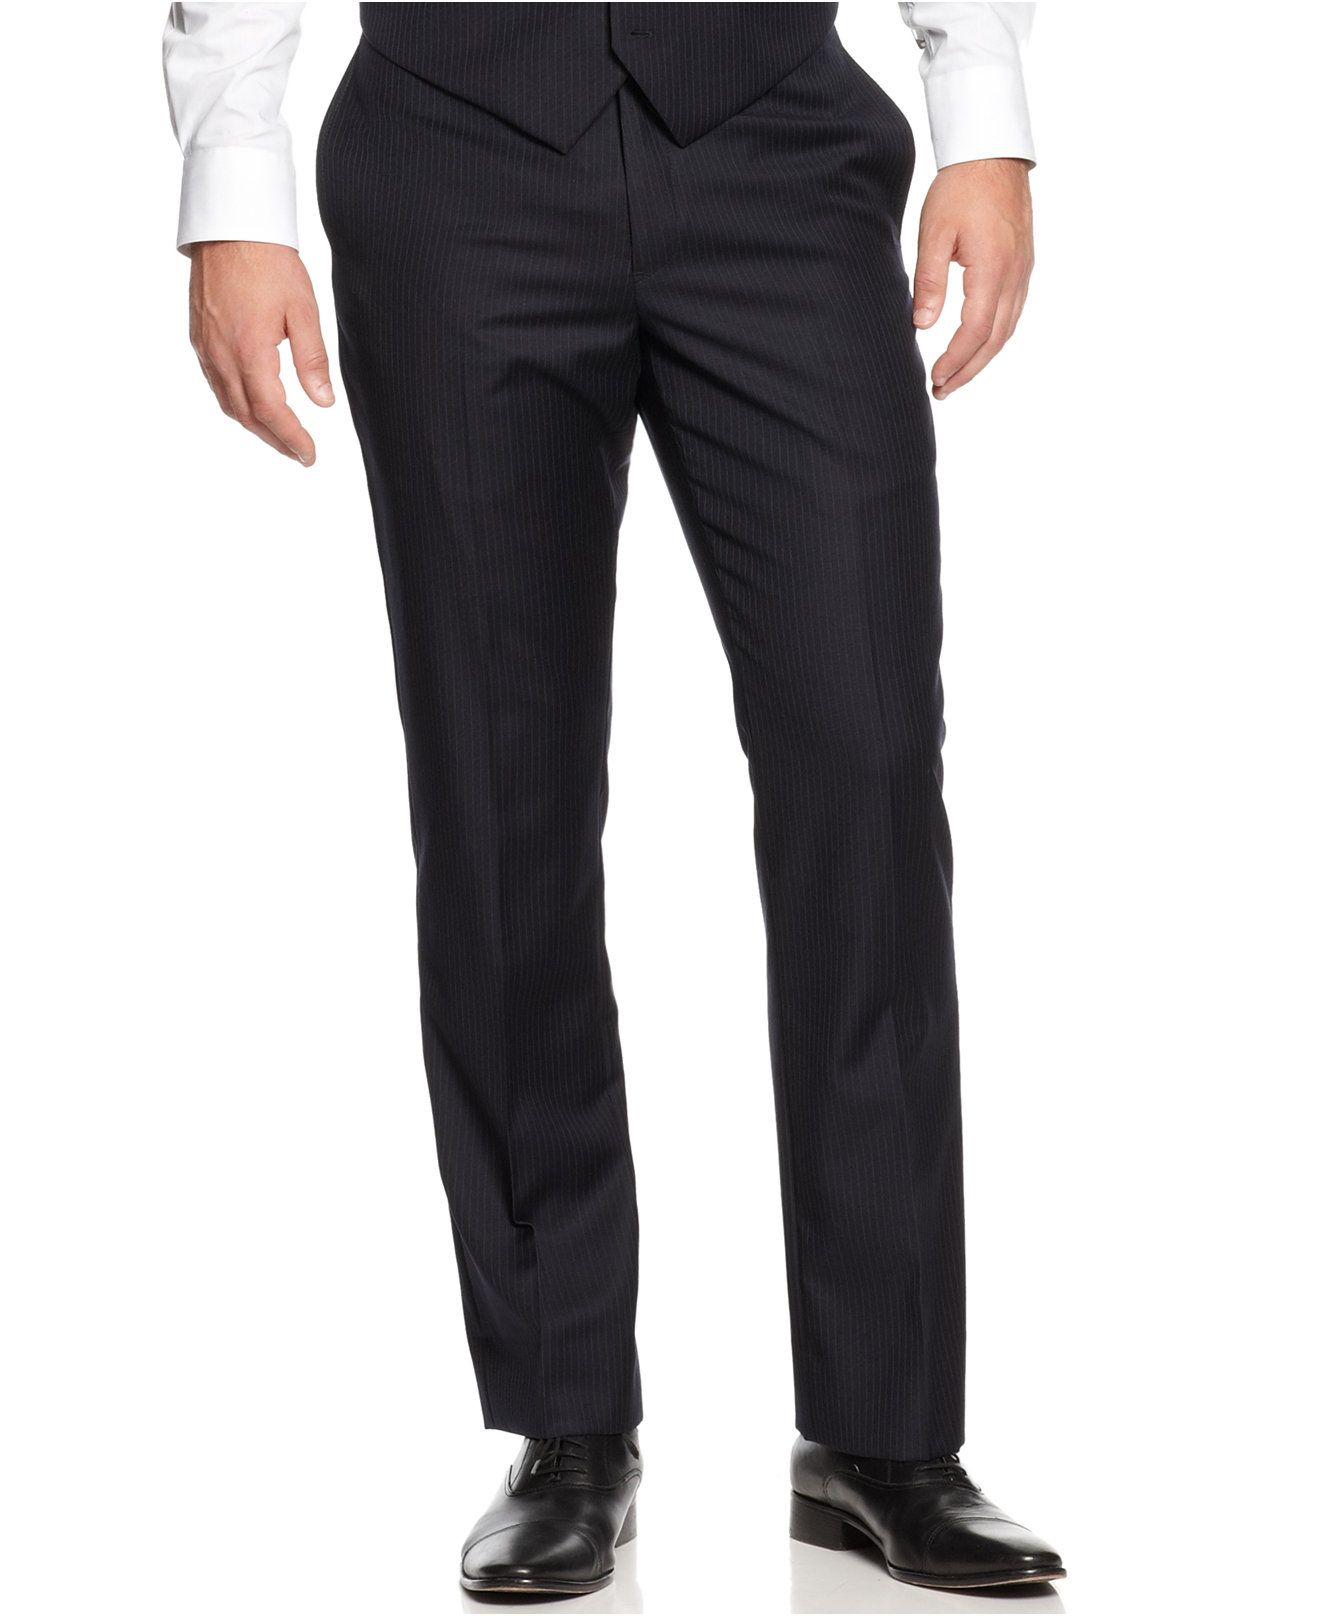 Tommy Hilfiger Navy Tonal Stripe Trim-Fit Pants